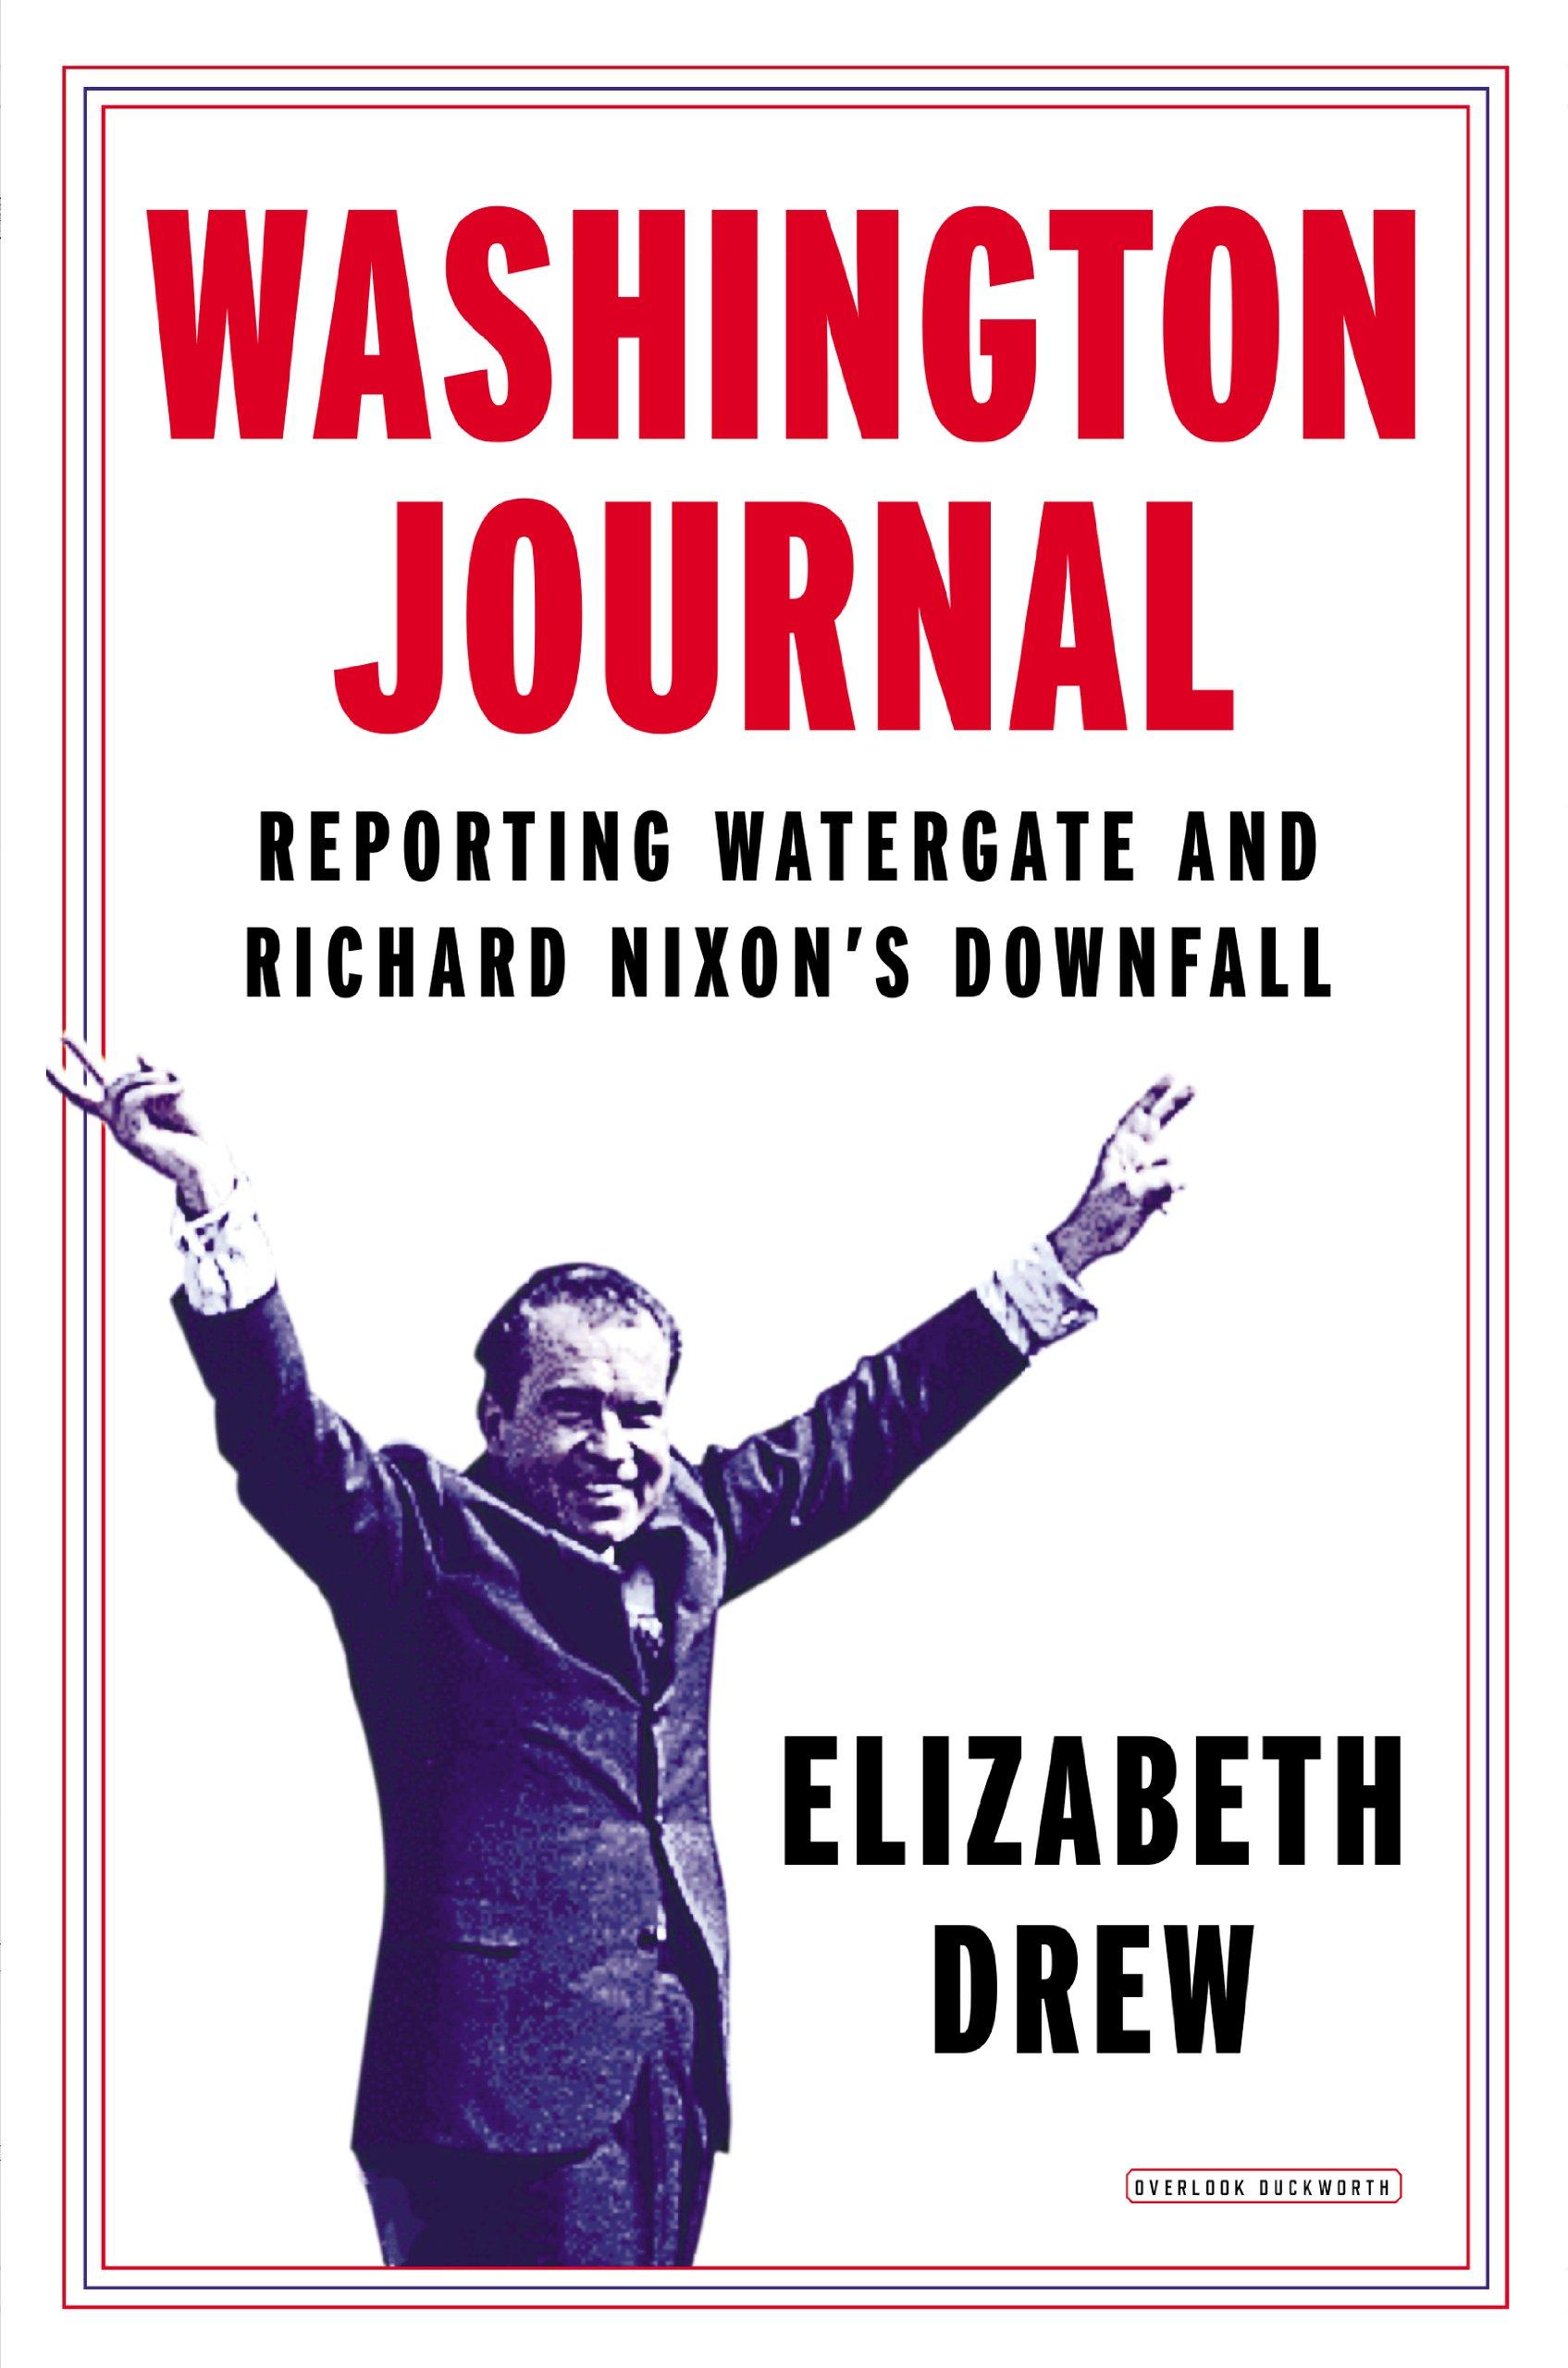 Washington Journal: Reporting Watergate and Richard Nixon's Downfall - Elizabeth Drew